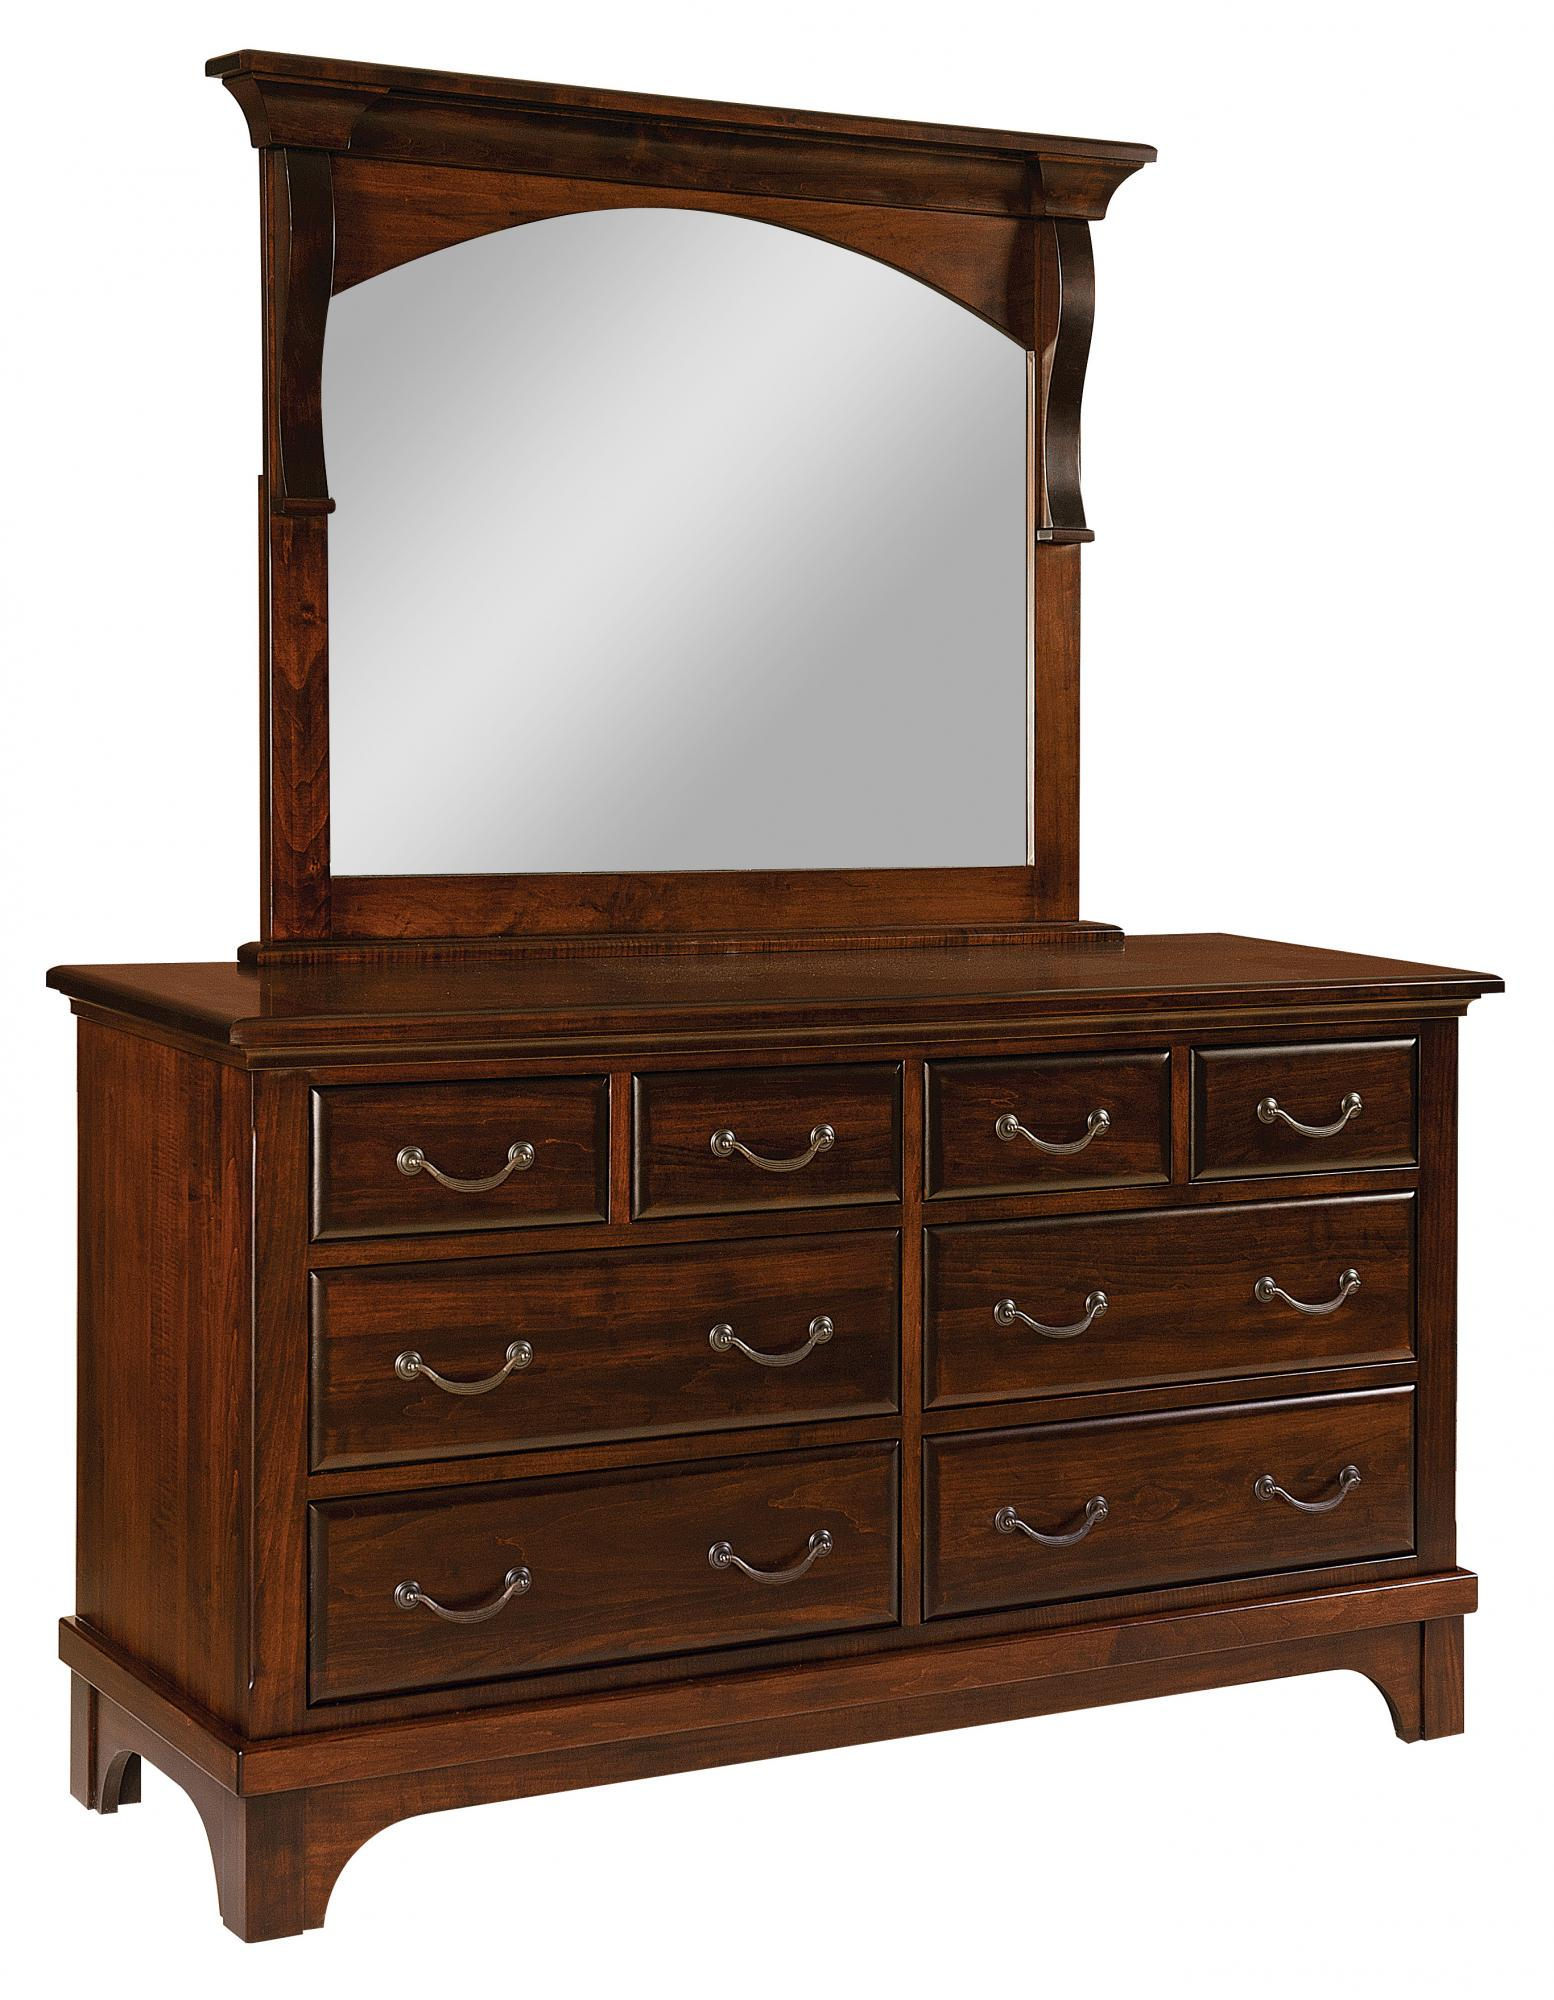 Hamilton Court 8 Drawer Dresser Amish Furniture Store Mankato MN